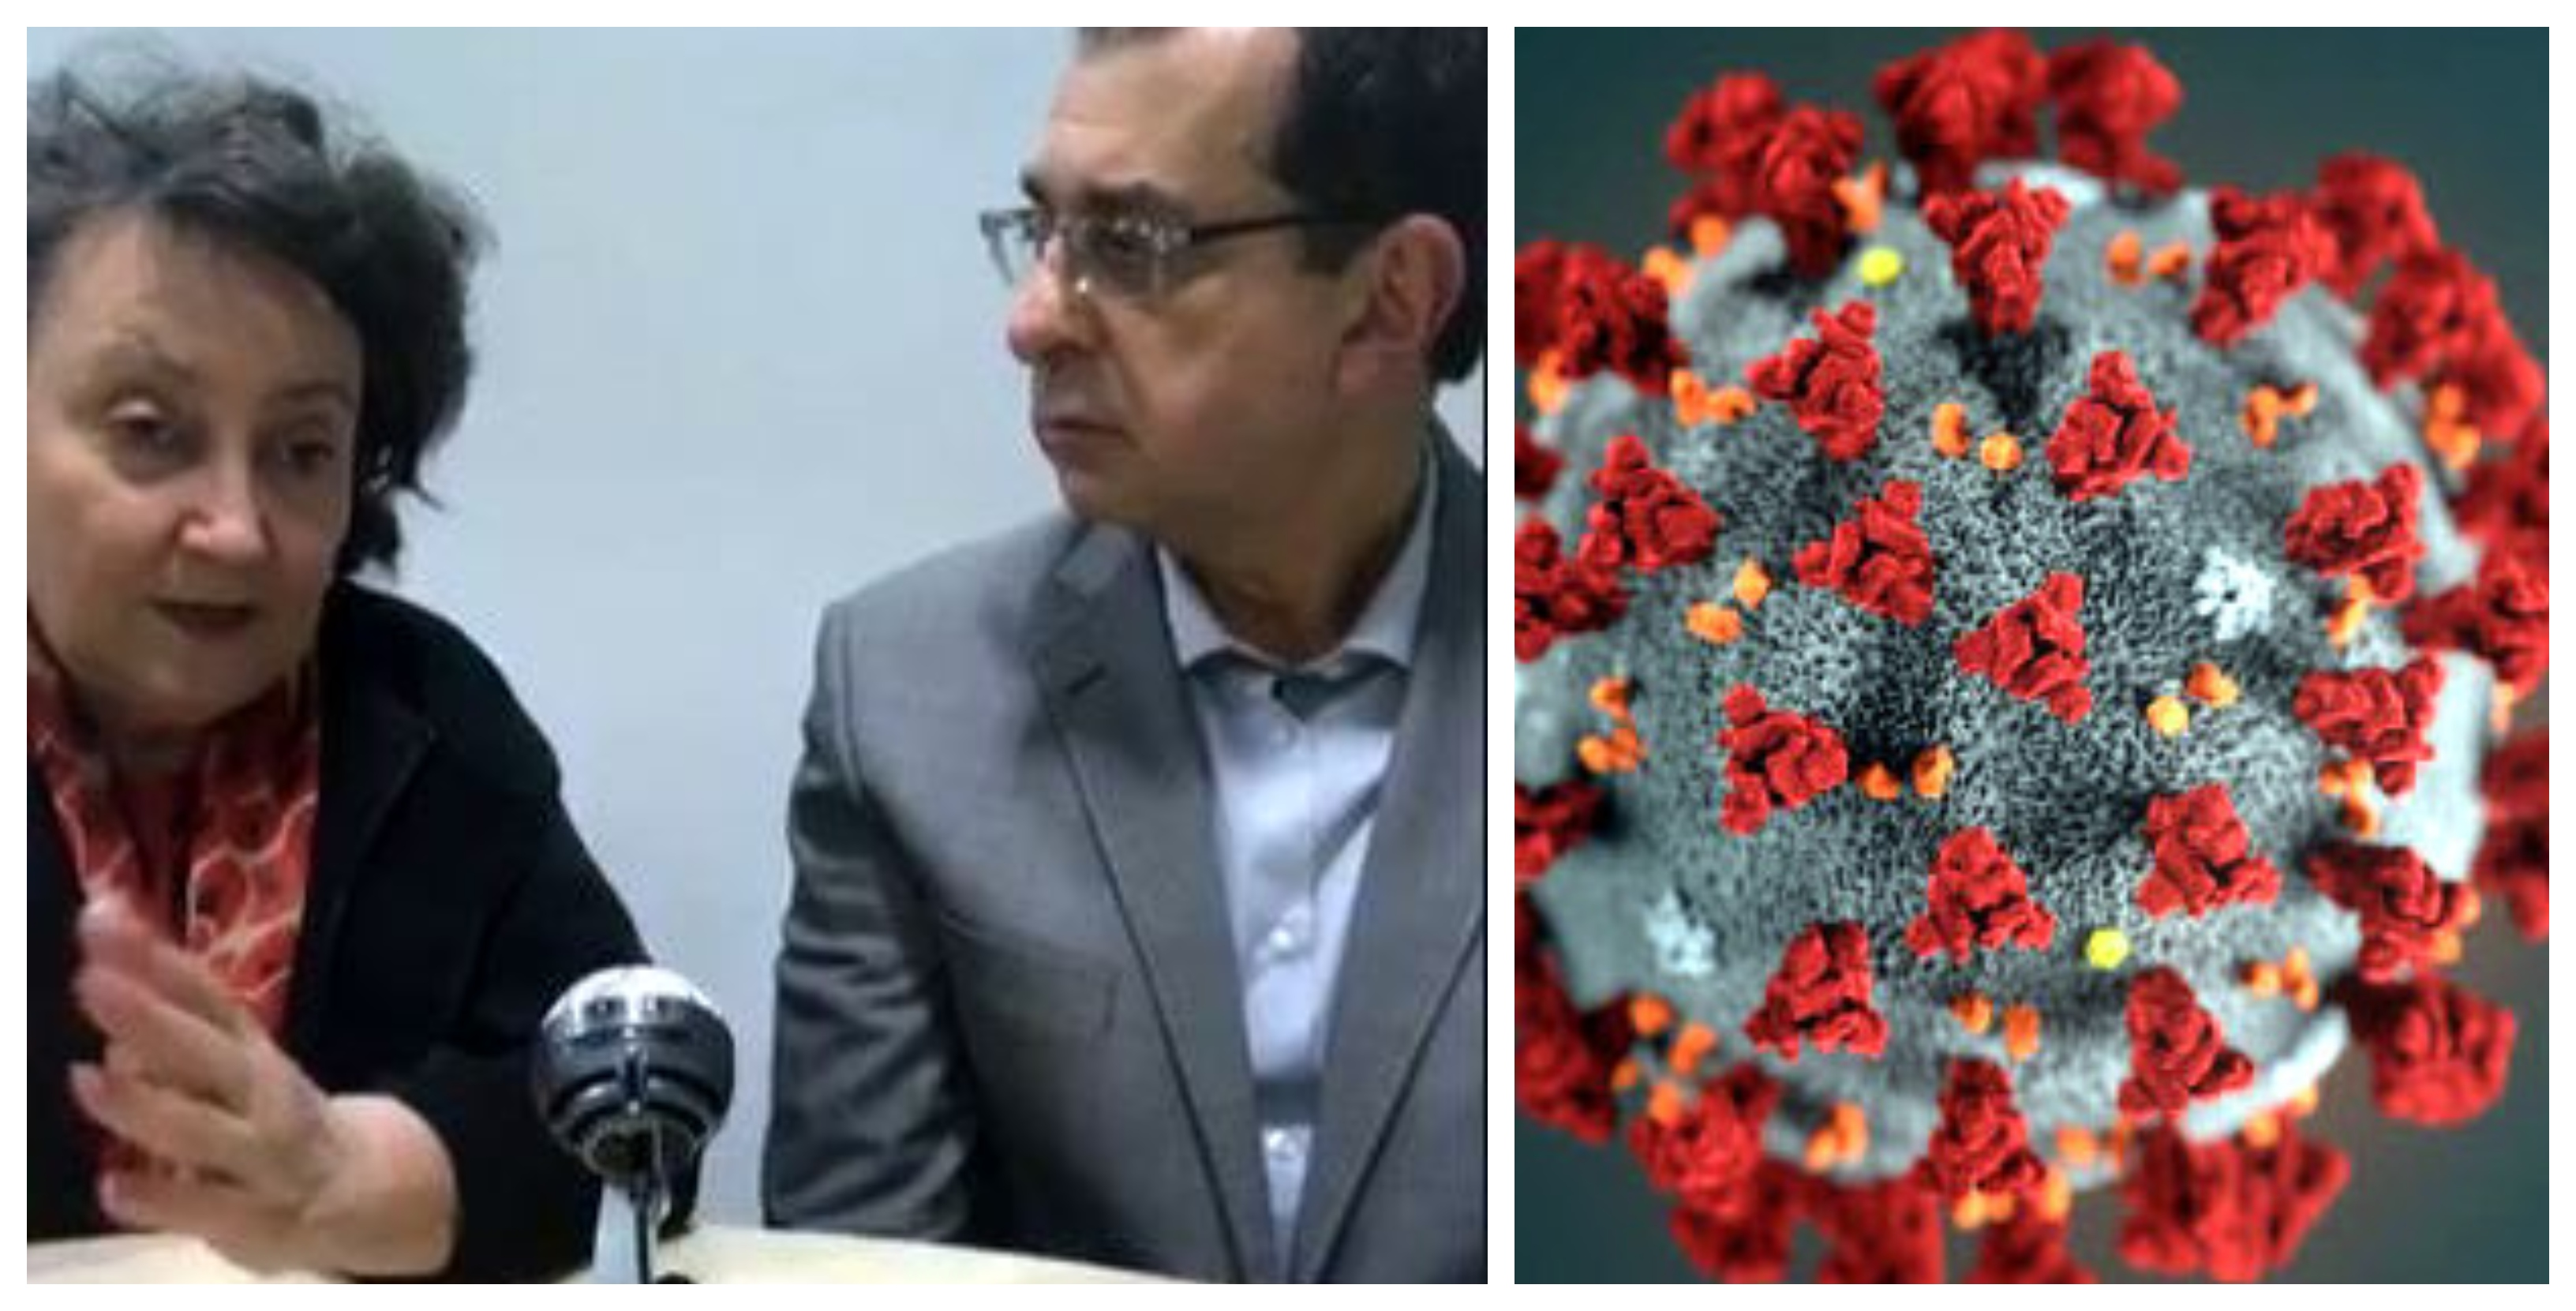 Assista à entrevista da pneumologista Margareth Dalcomo, da Fiocruz, sobre a pandemia do coronavírus; vídeo